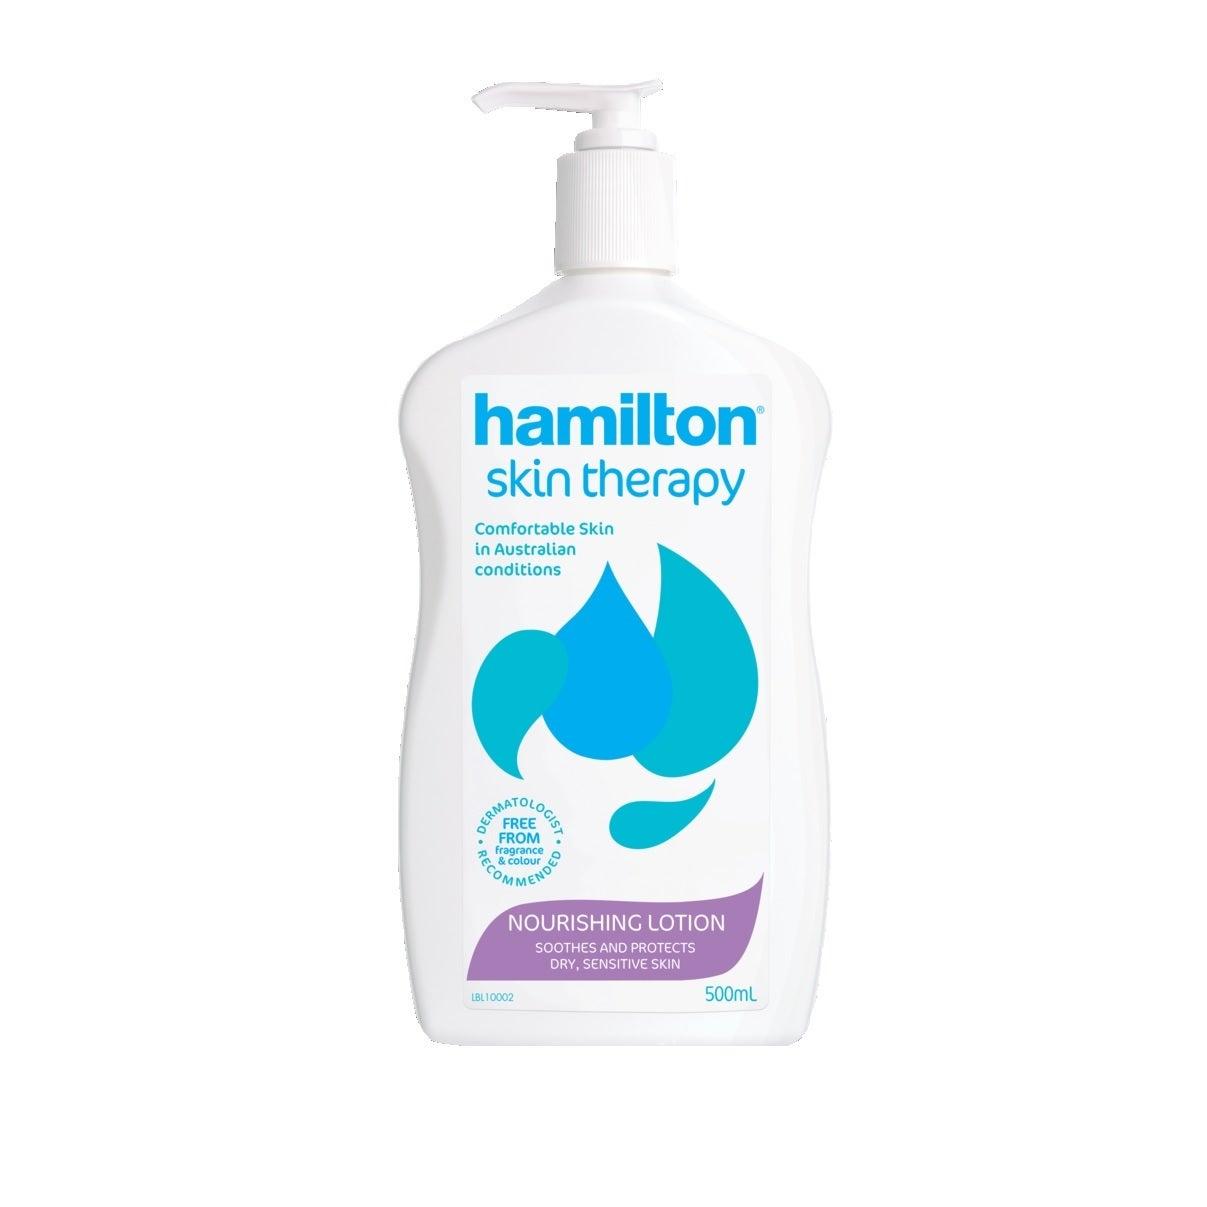 Hamilton Skin Therapy Nourishing Lotion 500mL